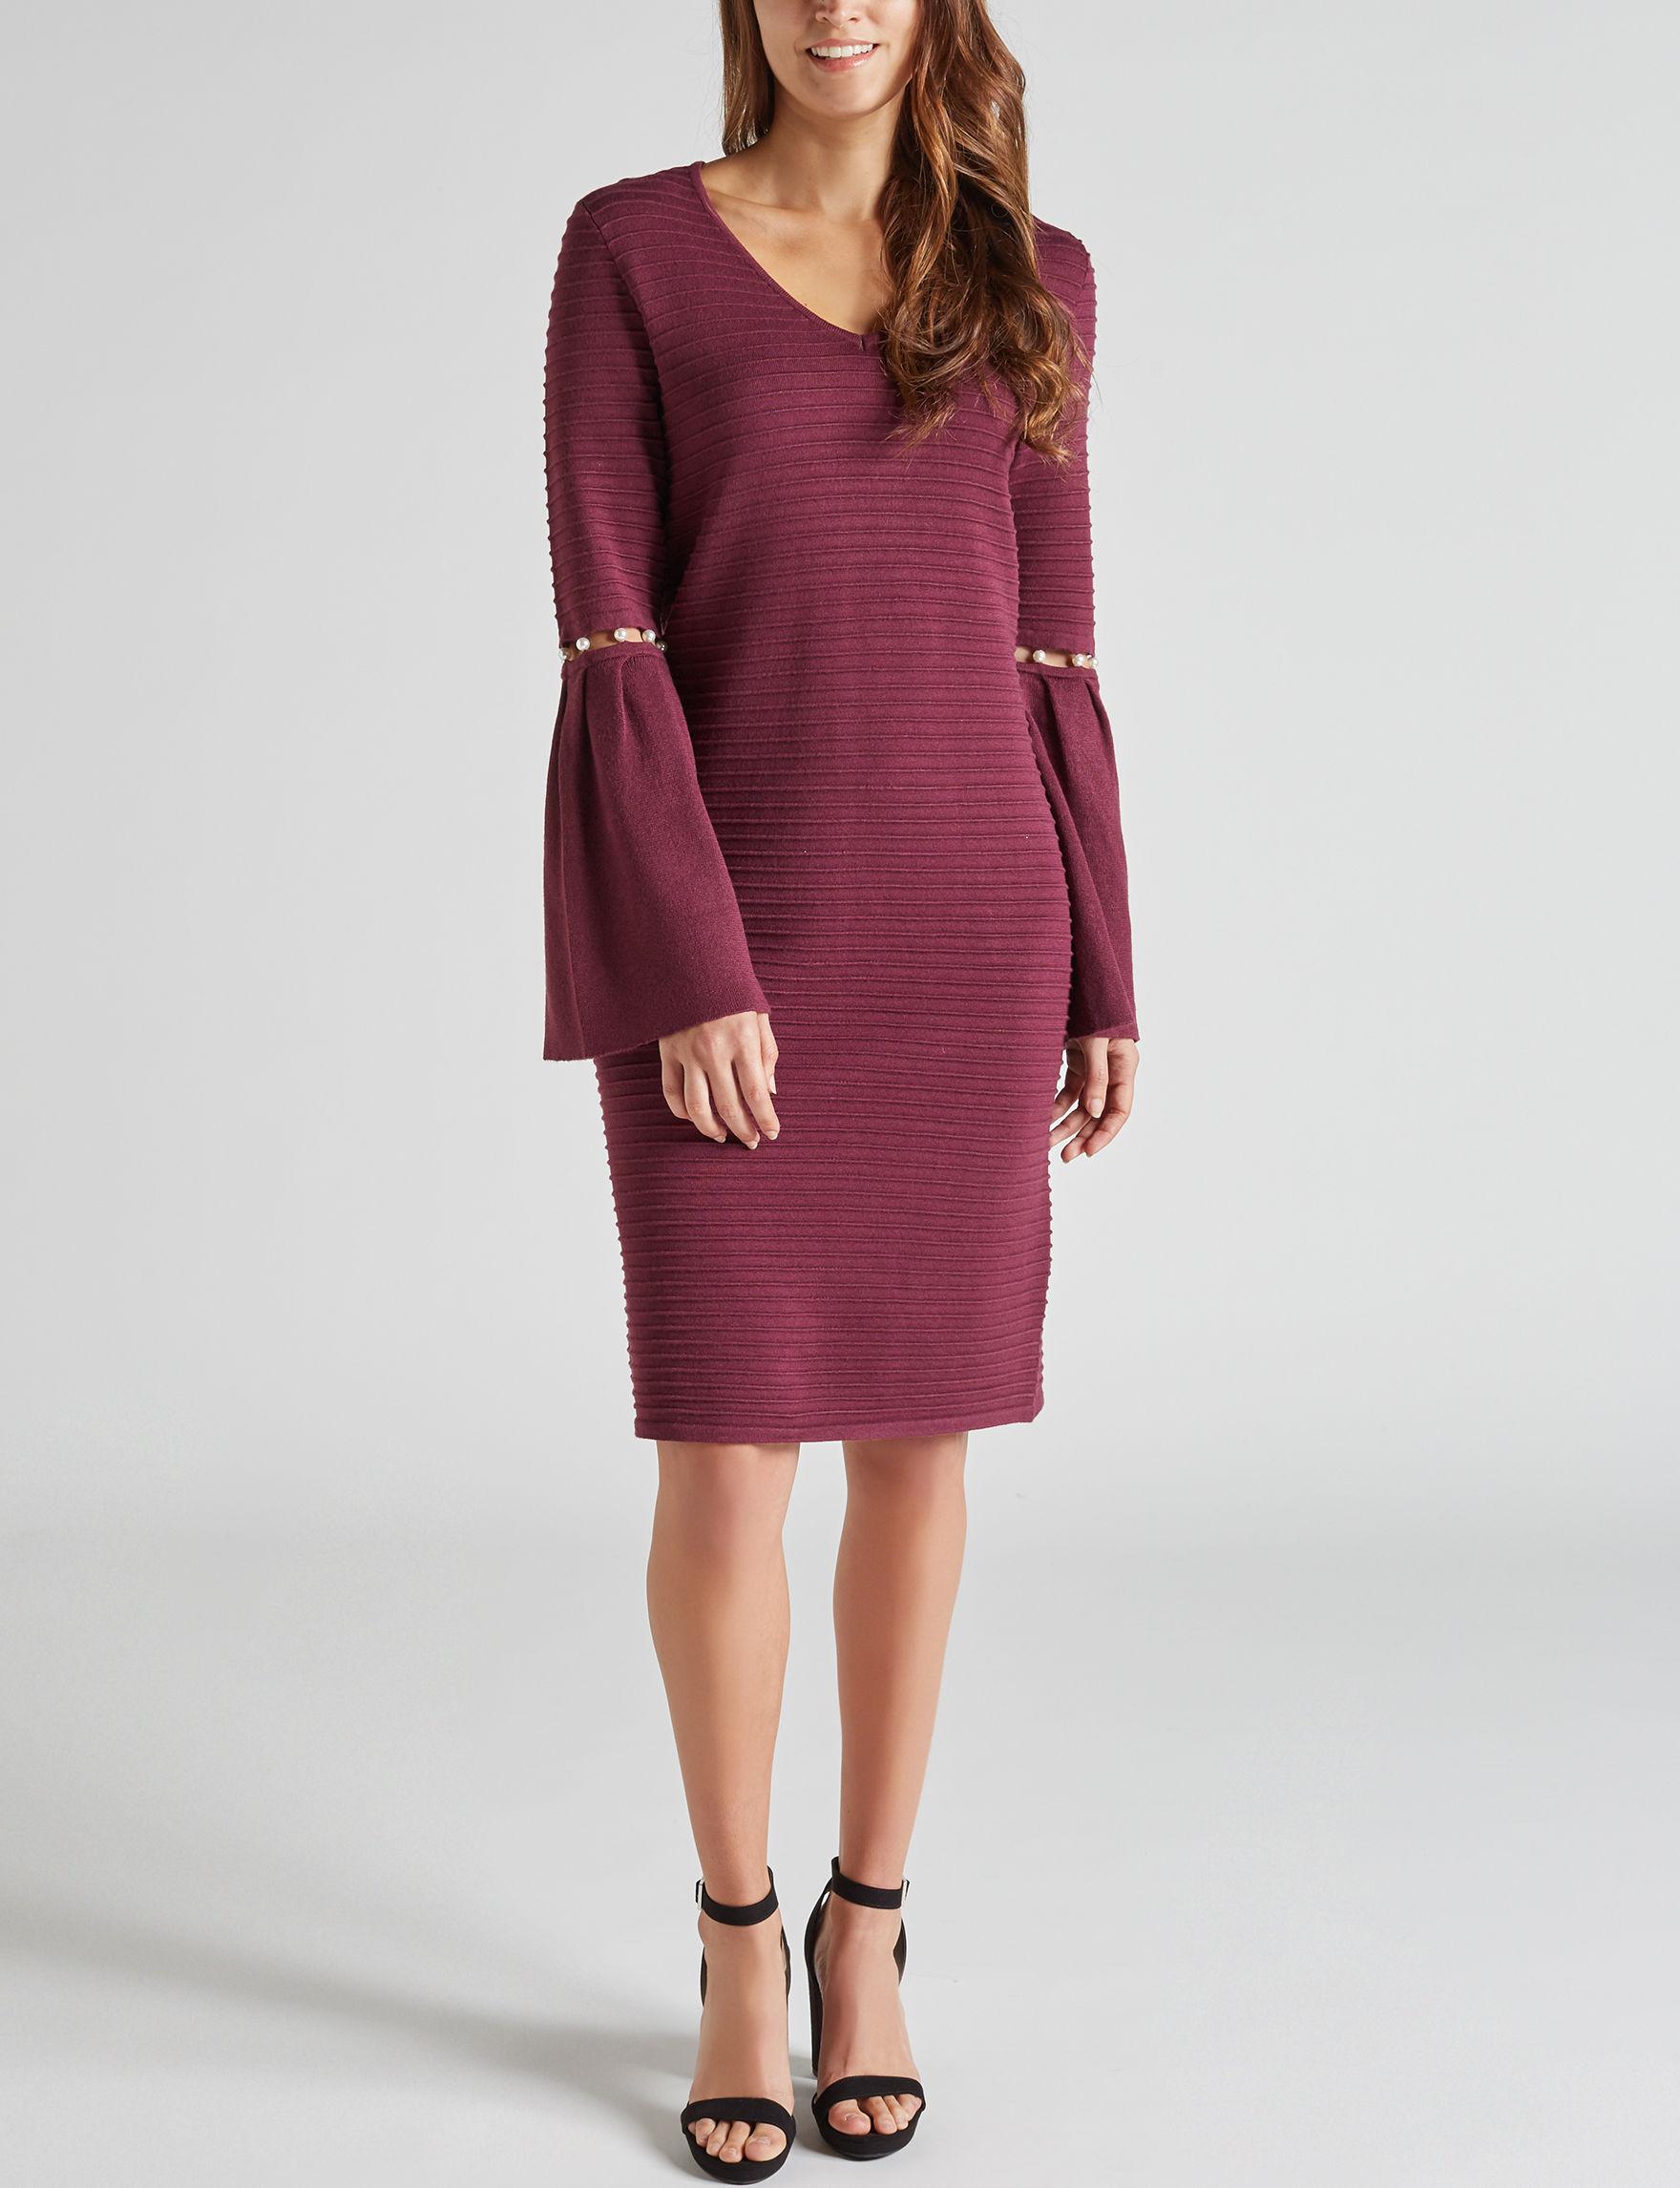 Harlow & Rose Burgundy Everyday & Casual Sweater Dresses